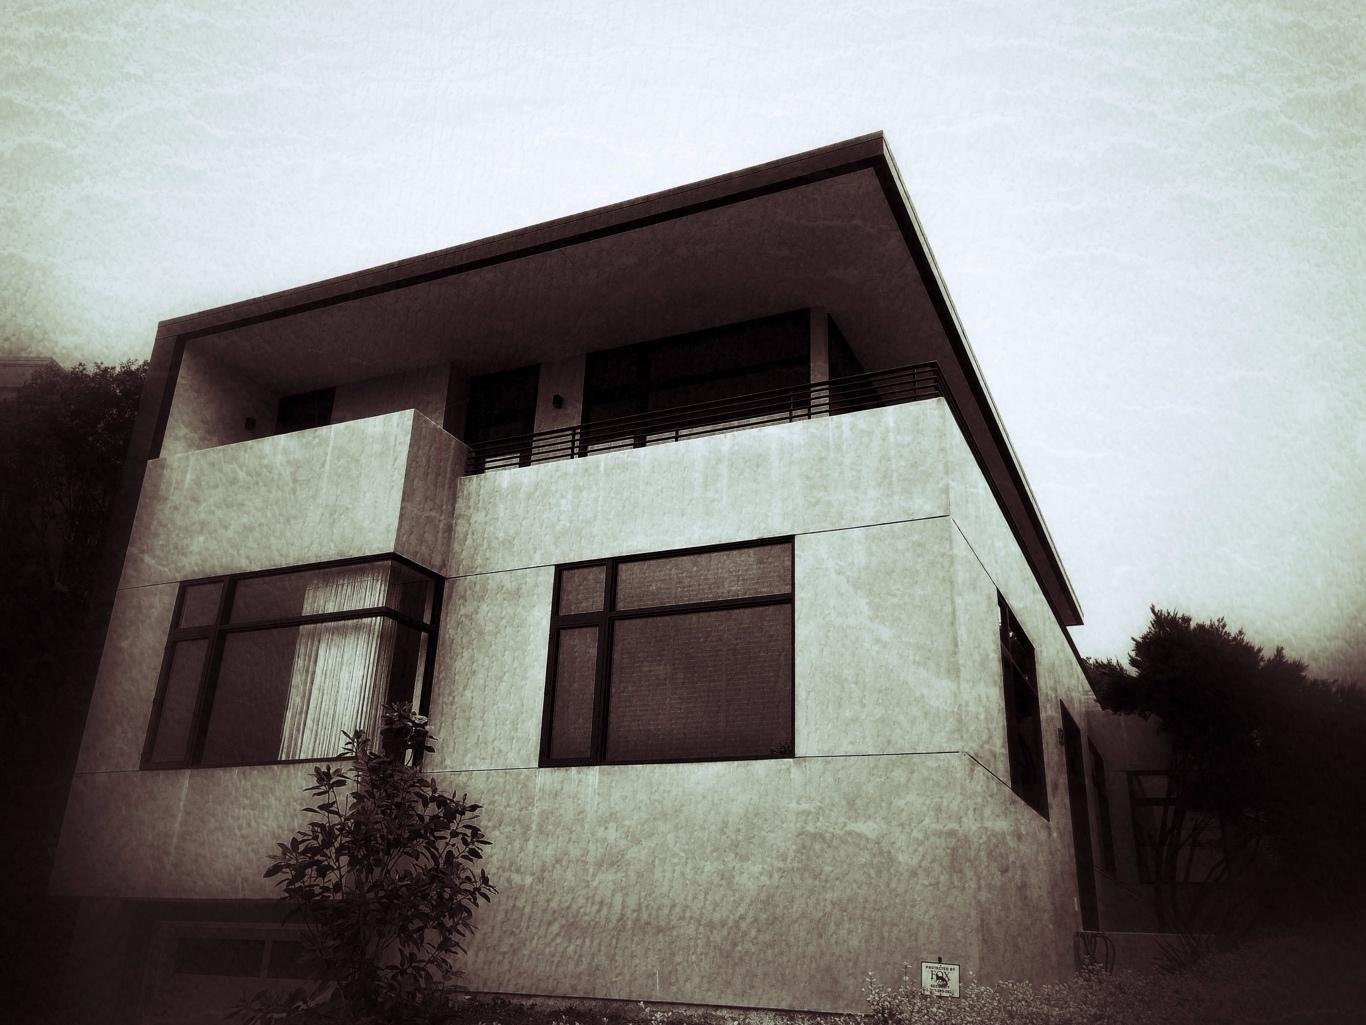 West Portal modern - photography - voiceofsf | ello